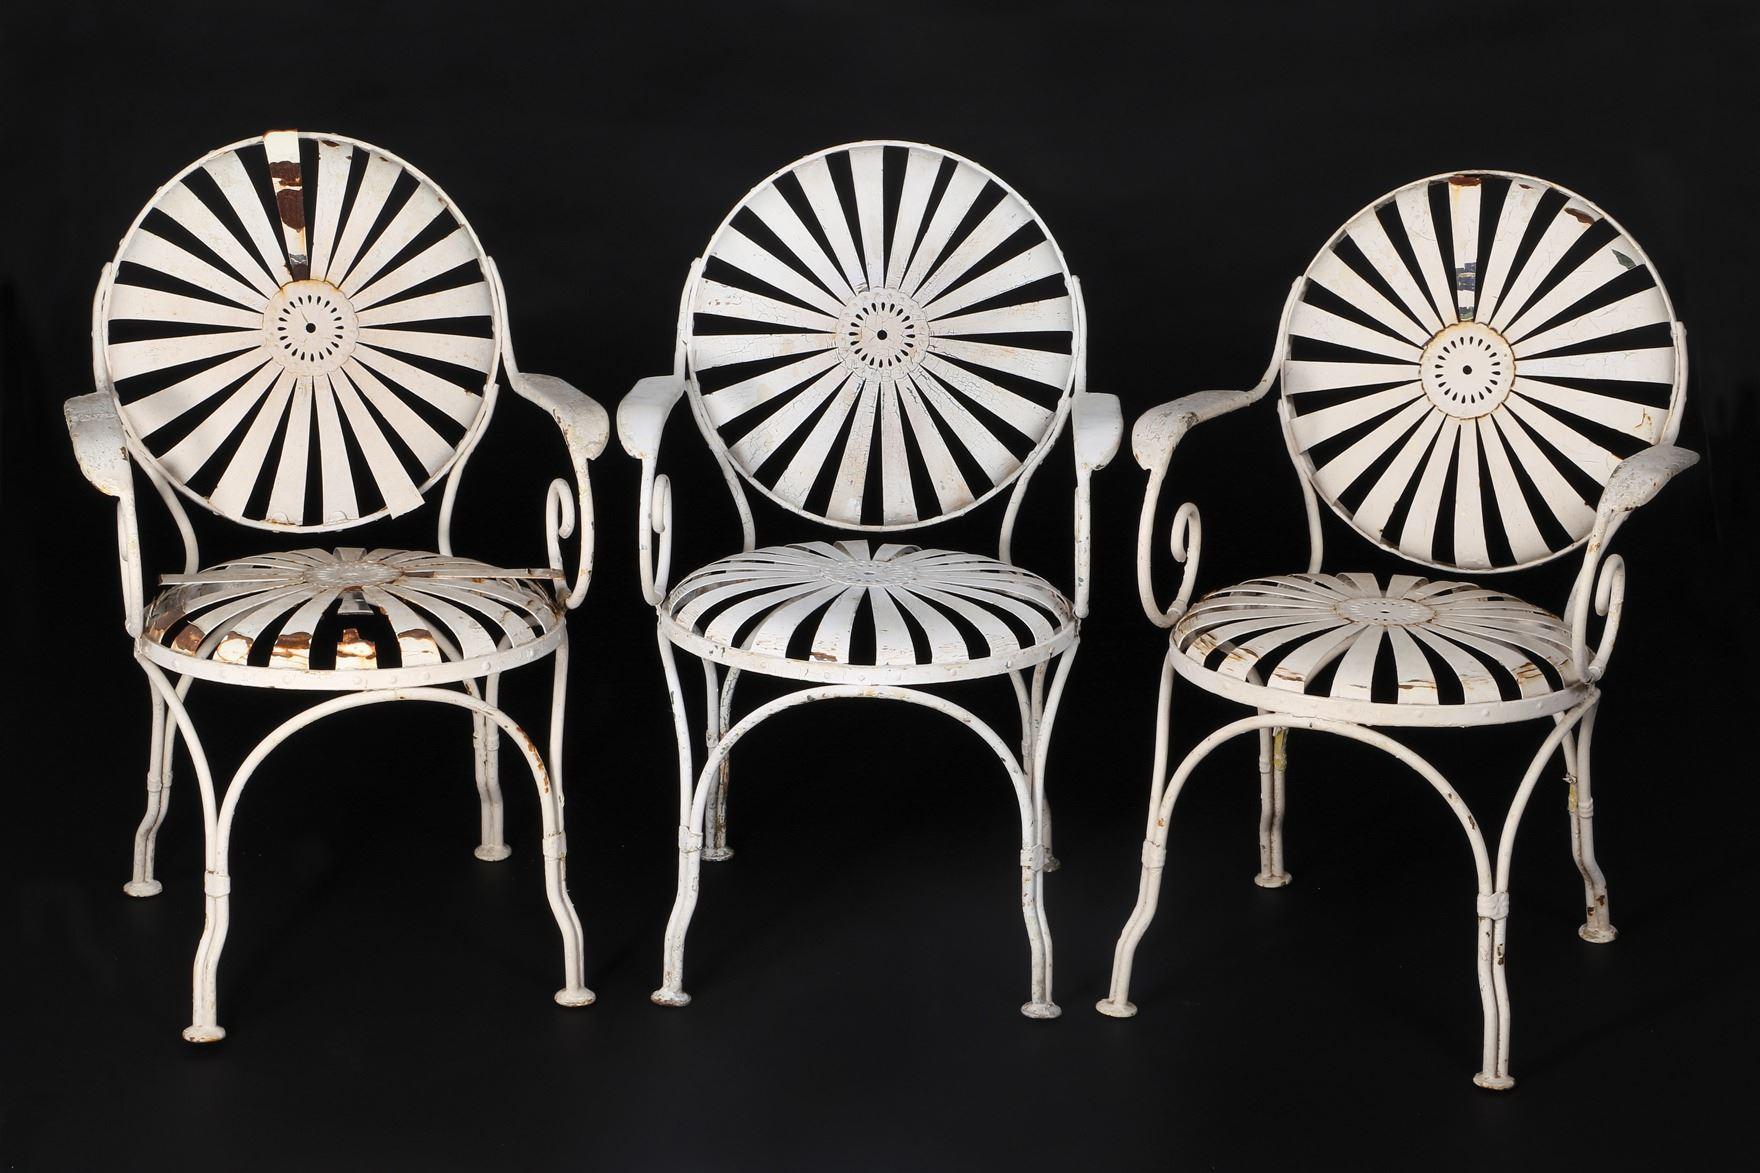 Image 1 : Casablanca (3) Metal Garden Chairs From Outside Ricku0027s Café  Américain.